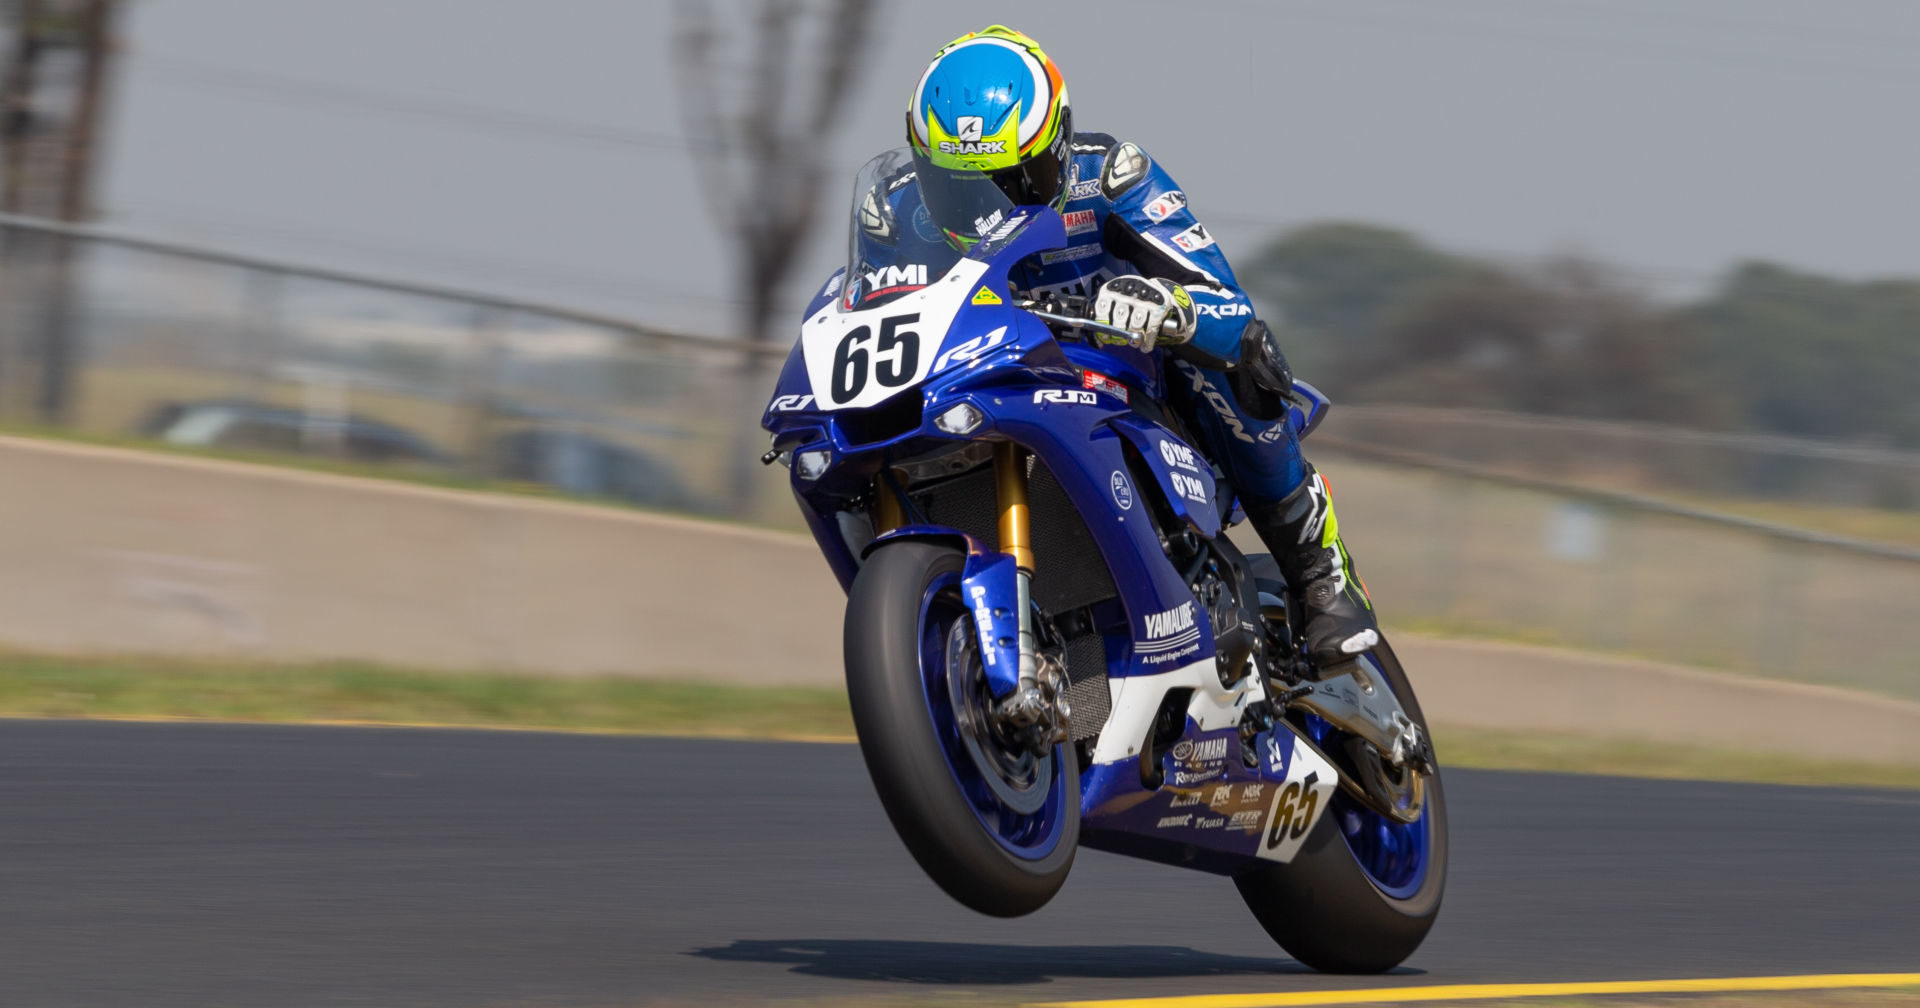 Cru Halliday (65). Photo courtesy of Motorcycling Australia.